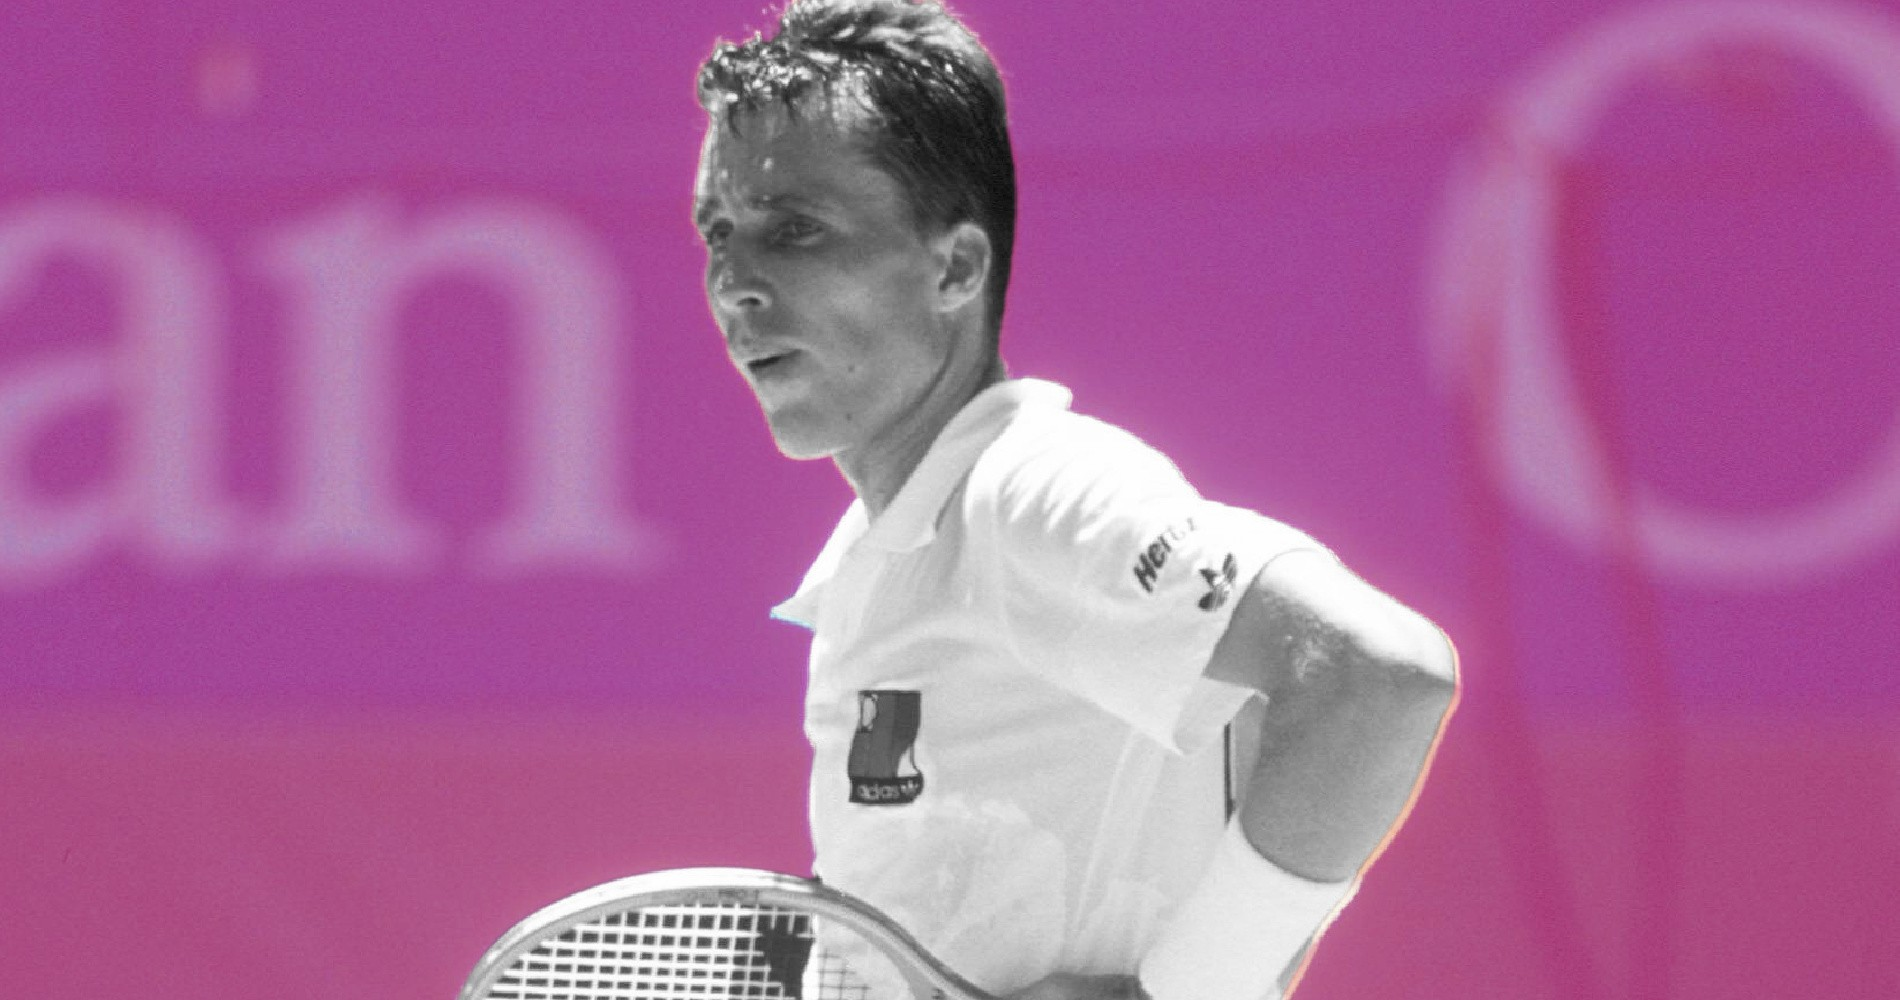 Ivan Lendl, On this day 18.03.2021